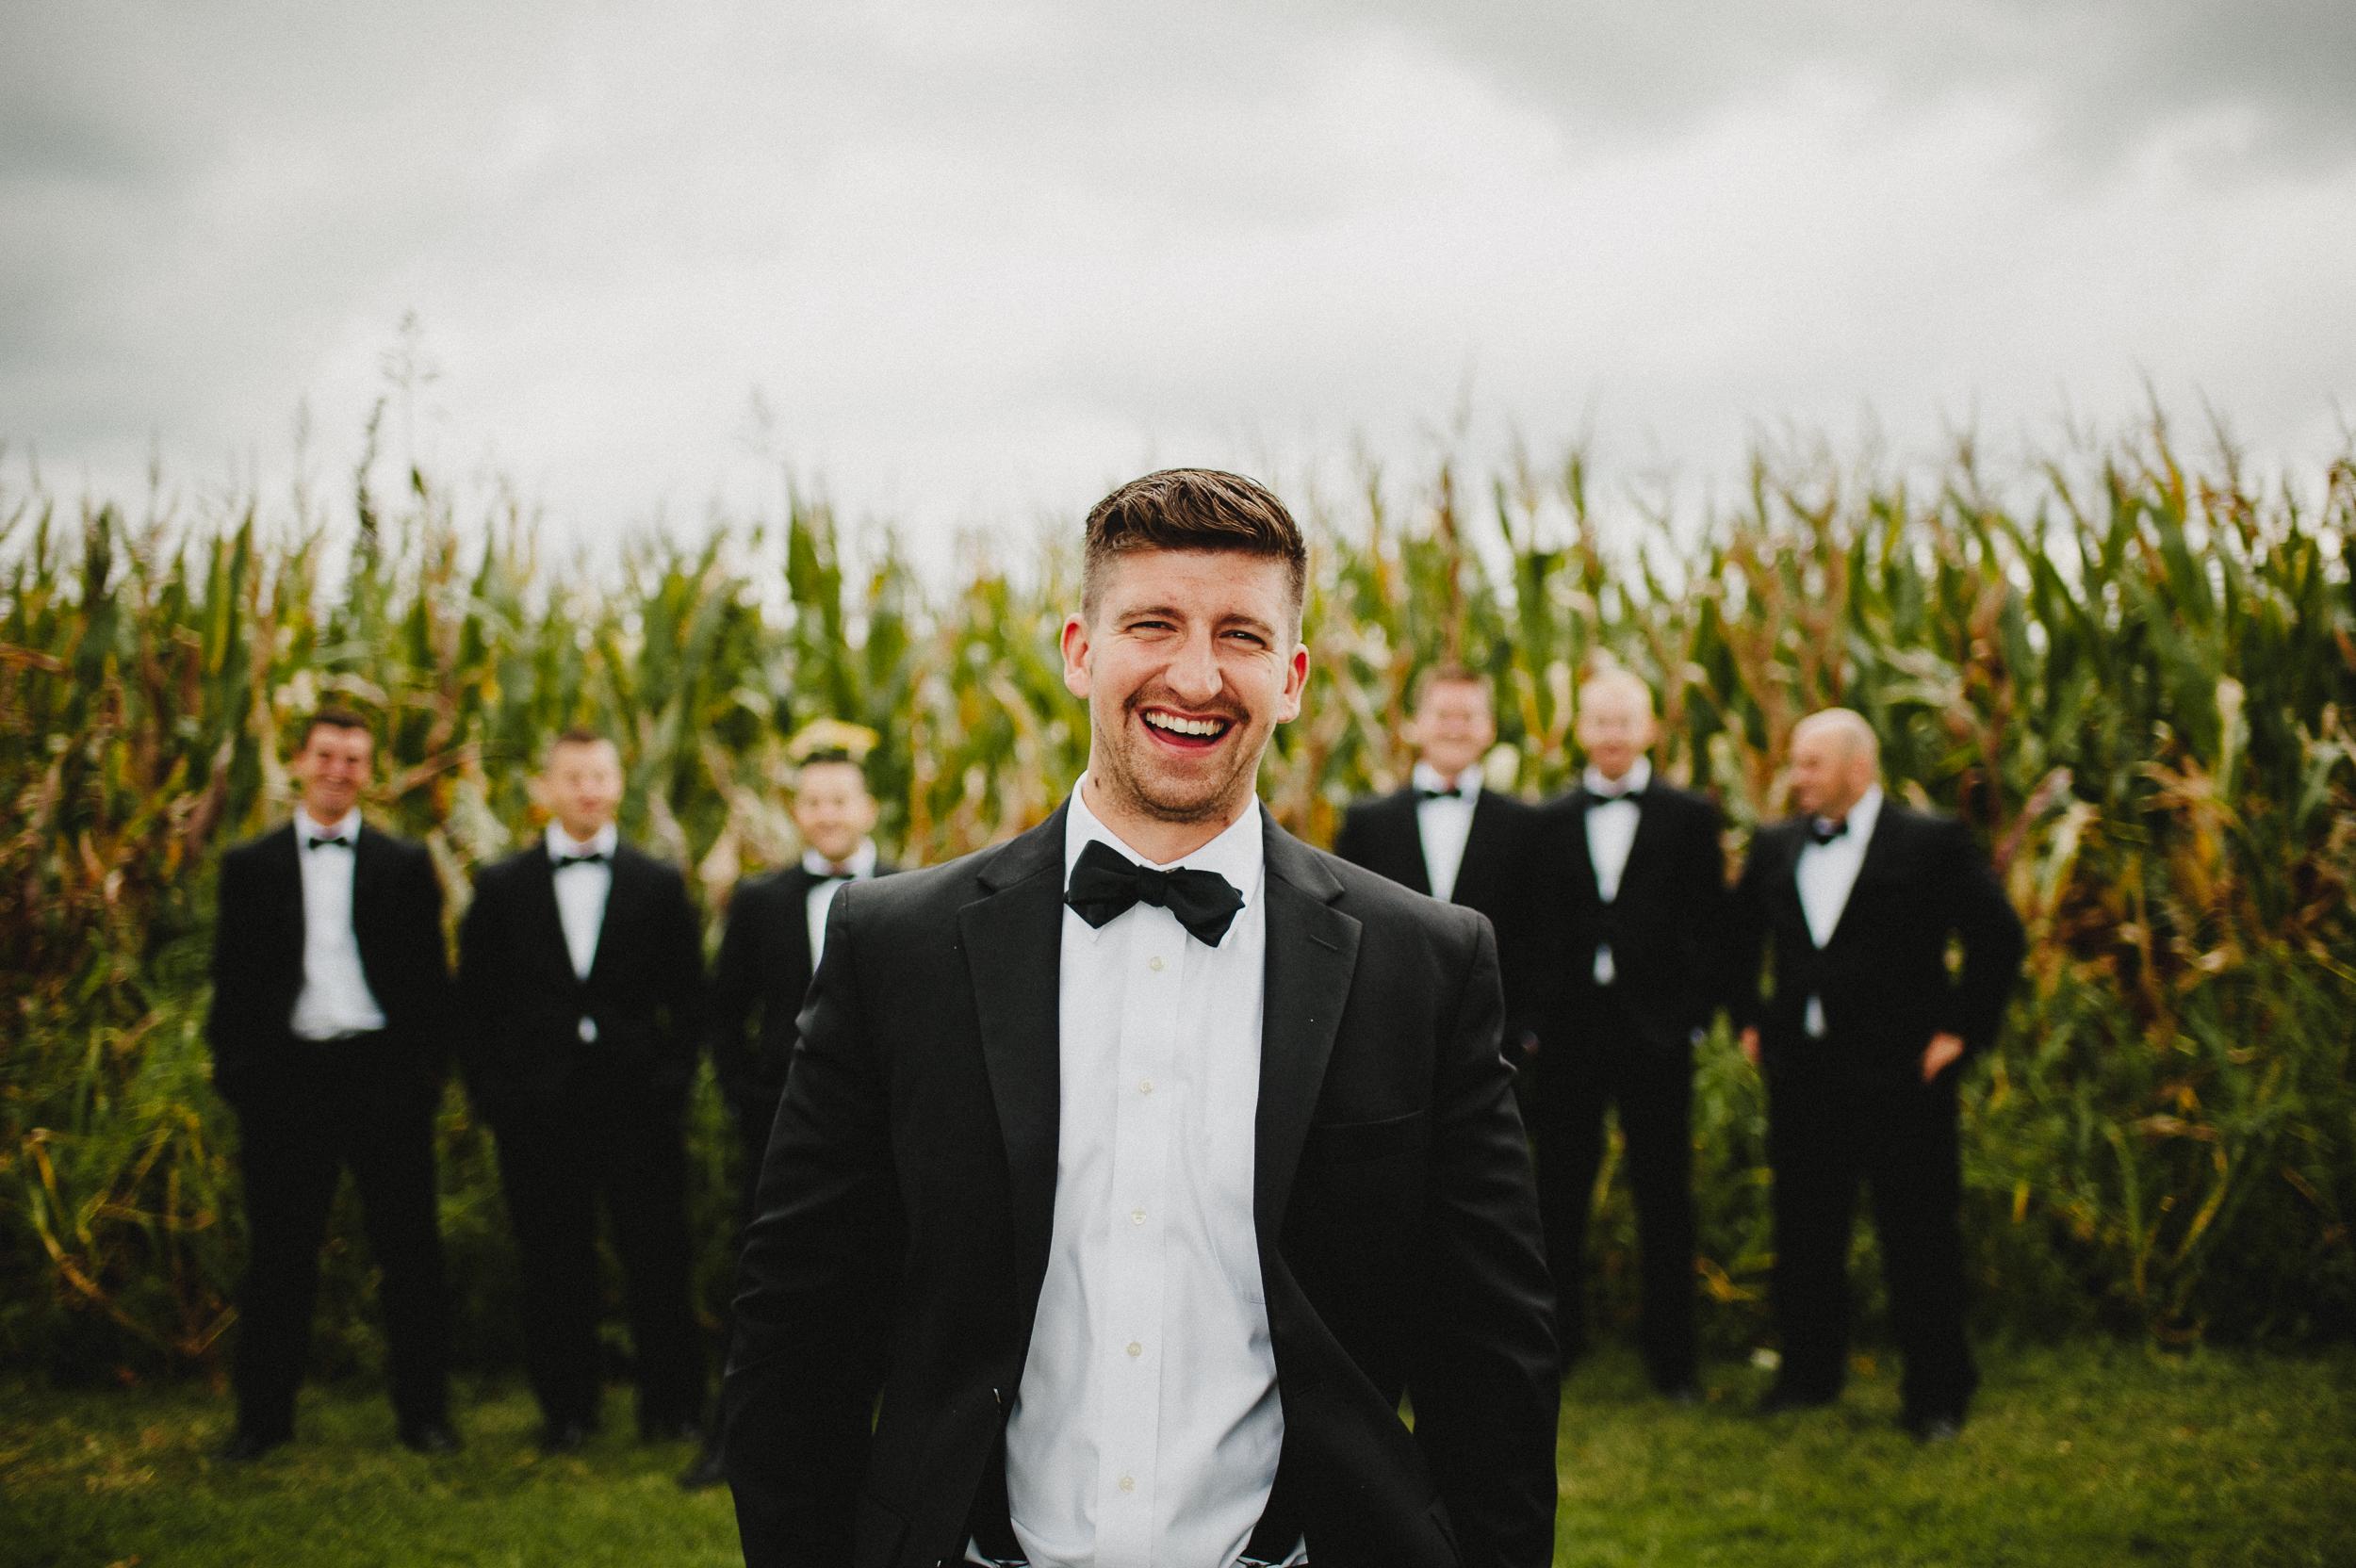 delaware-estate-wedding-photographer-pat-robinson-photography-53.jpg